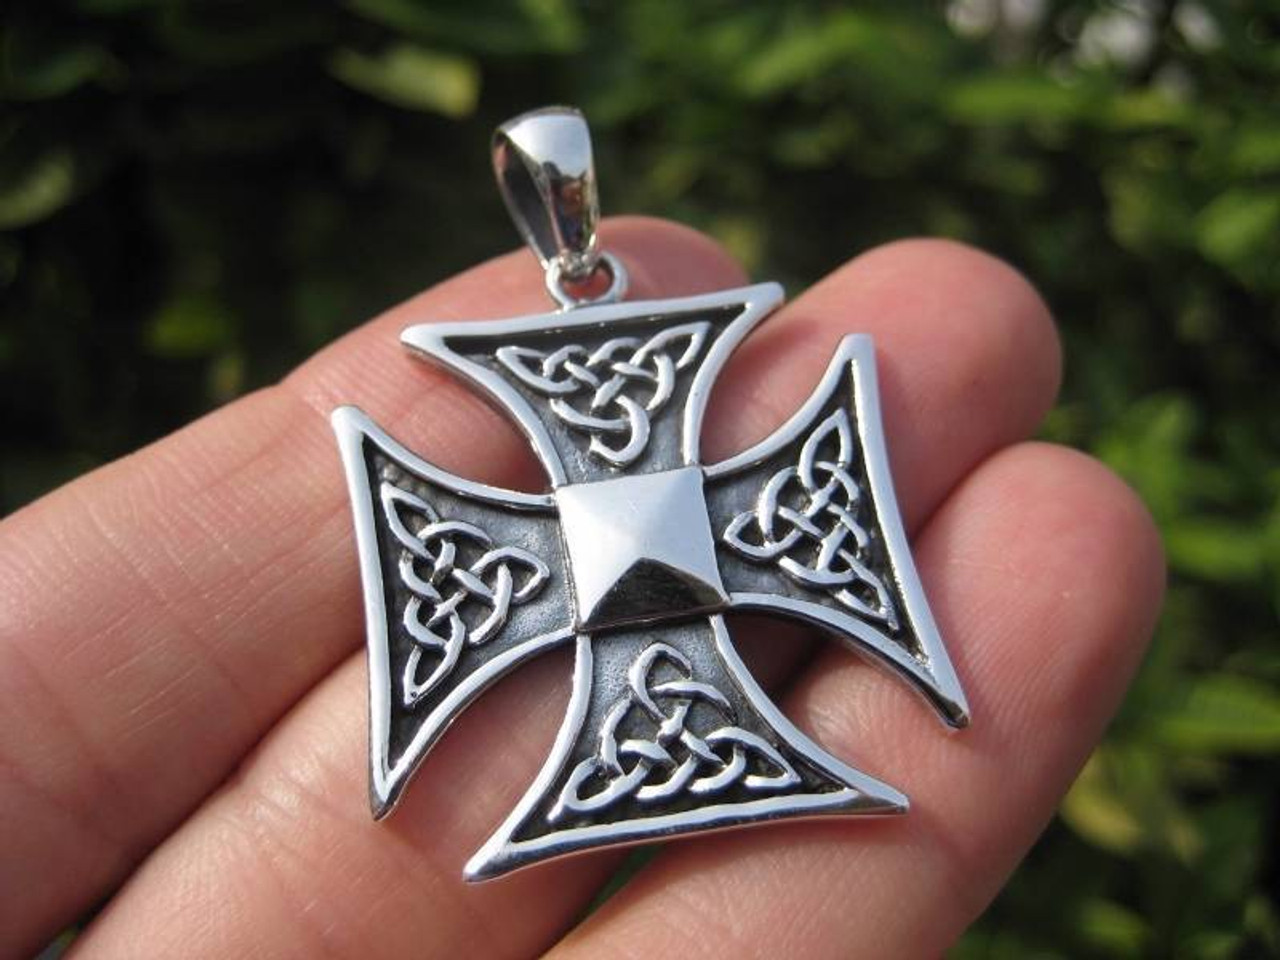 925 Silver Knight Knights Iron Cross Templar Pendant Jewelry art A12